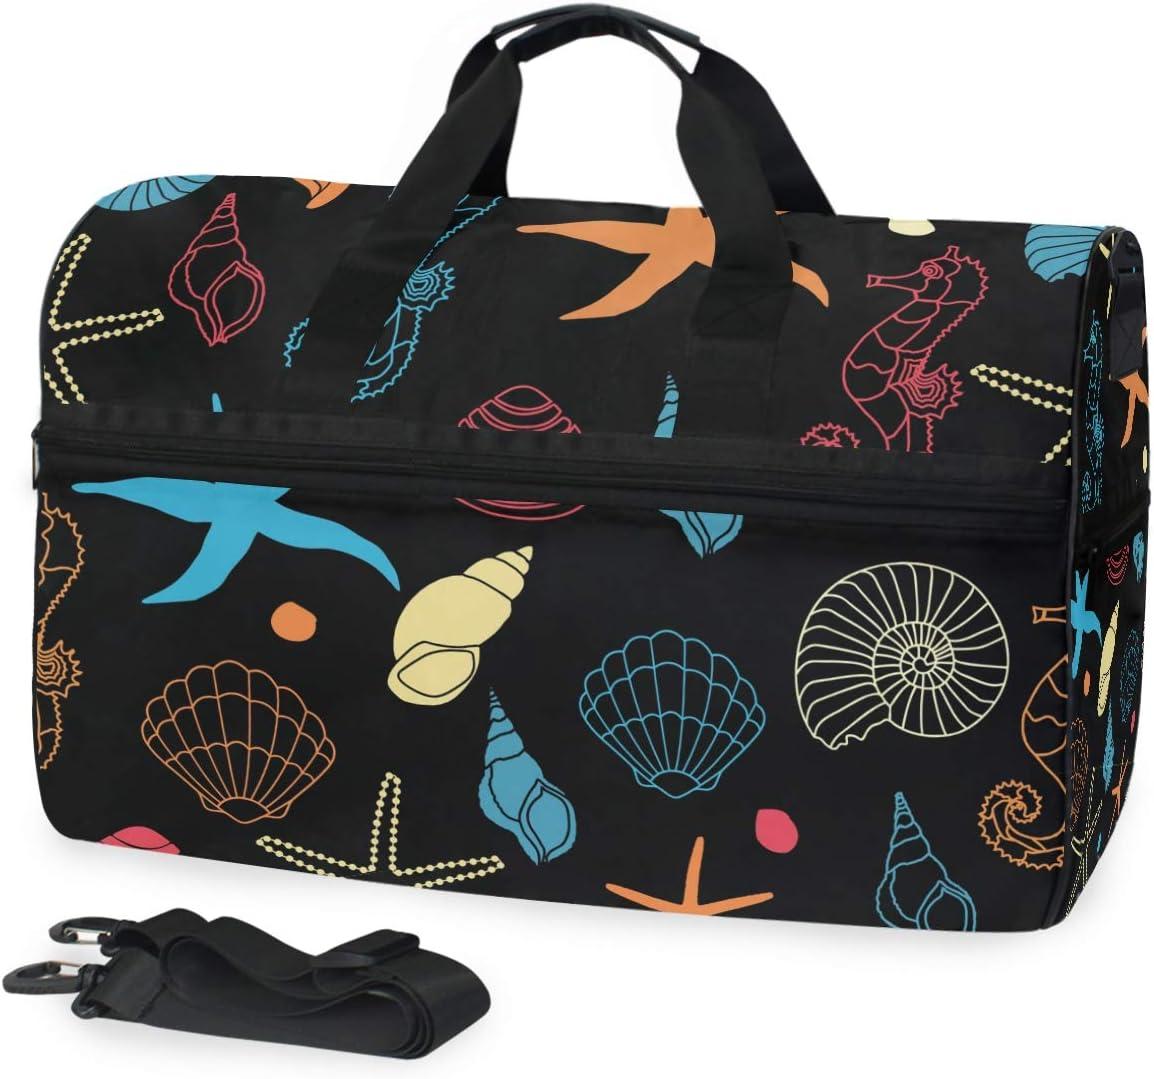 MALPLENA Blue Red Seahorse Stars Conch Packable Duffle Bag For Men Women Tear Resistant Sports Duffle